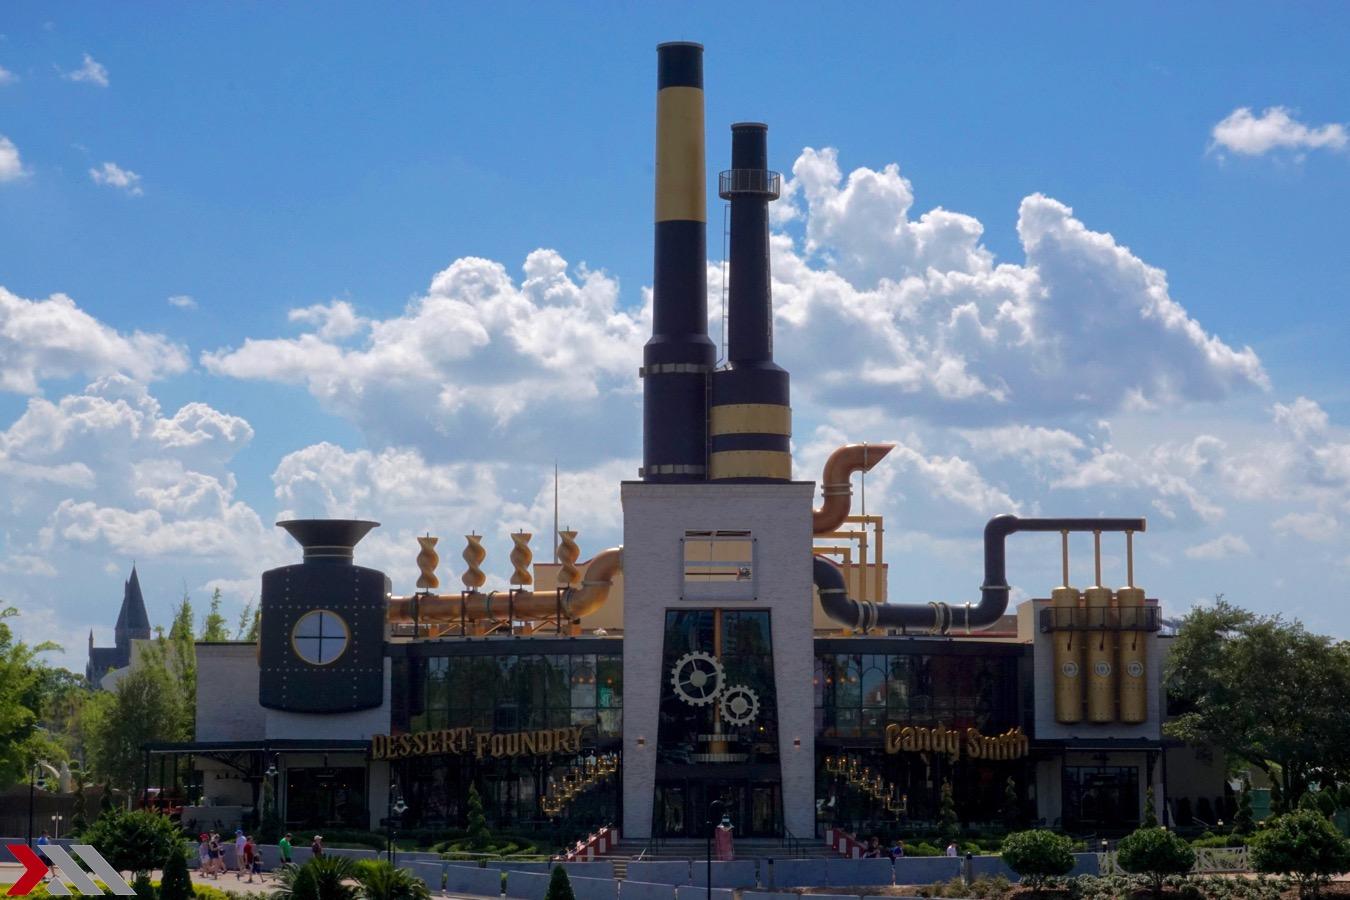 Toothsome Chocolate Emporium Adding Steampunk Sweets to Universal Orlando's Citywalk